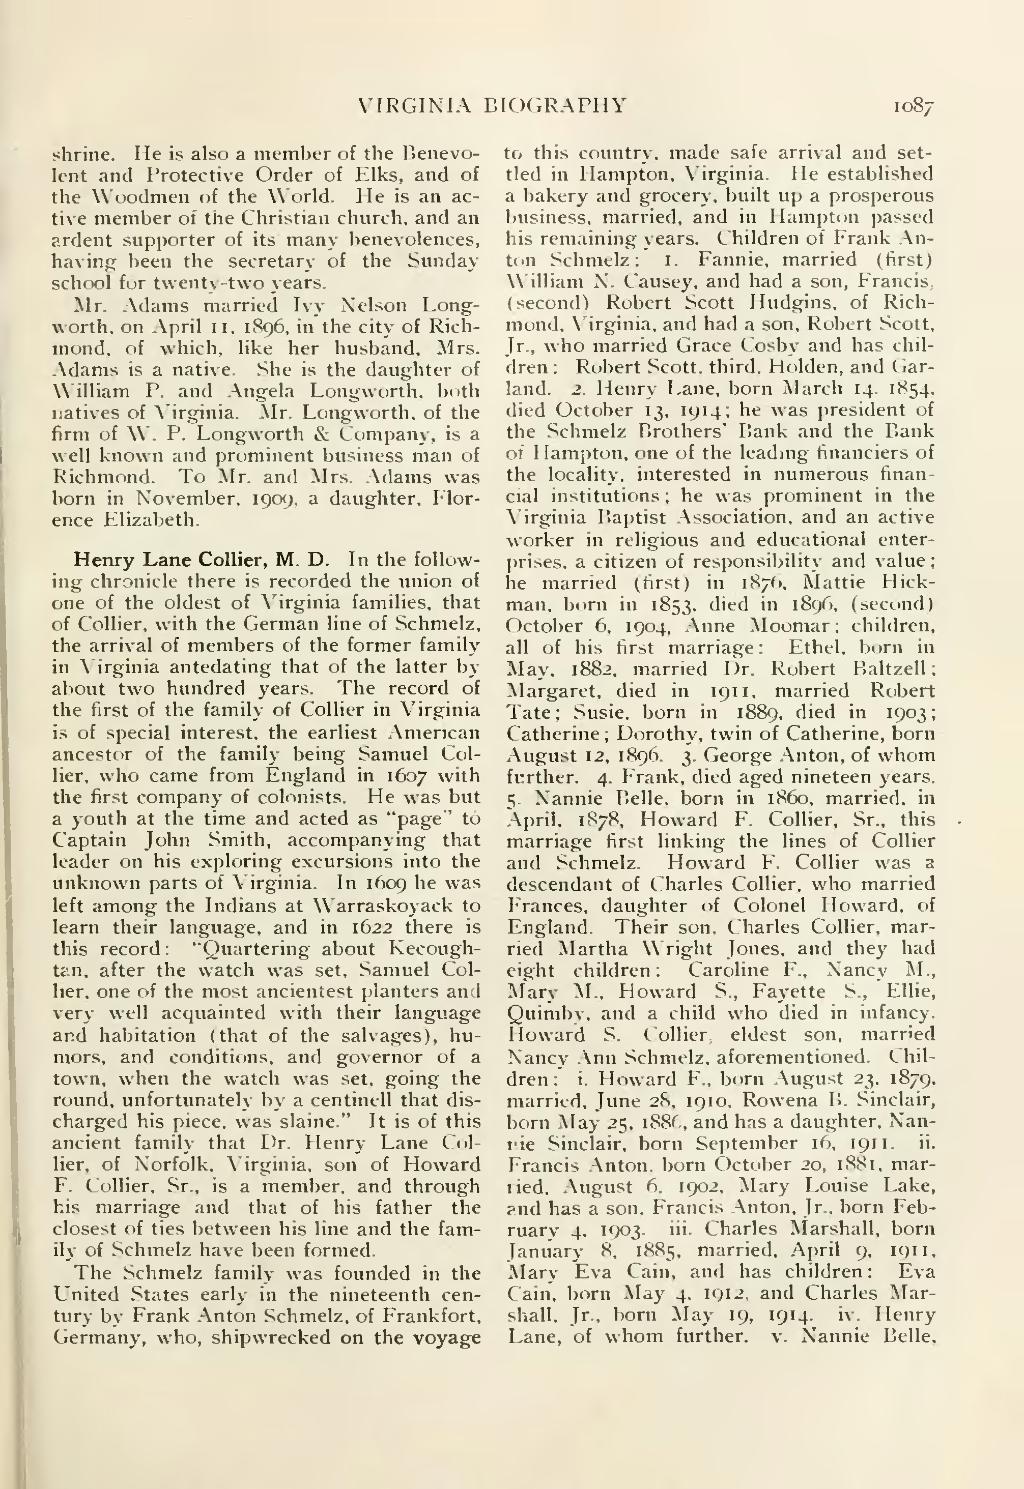 encyclopedia of virginia biography vol. iv